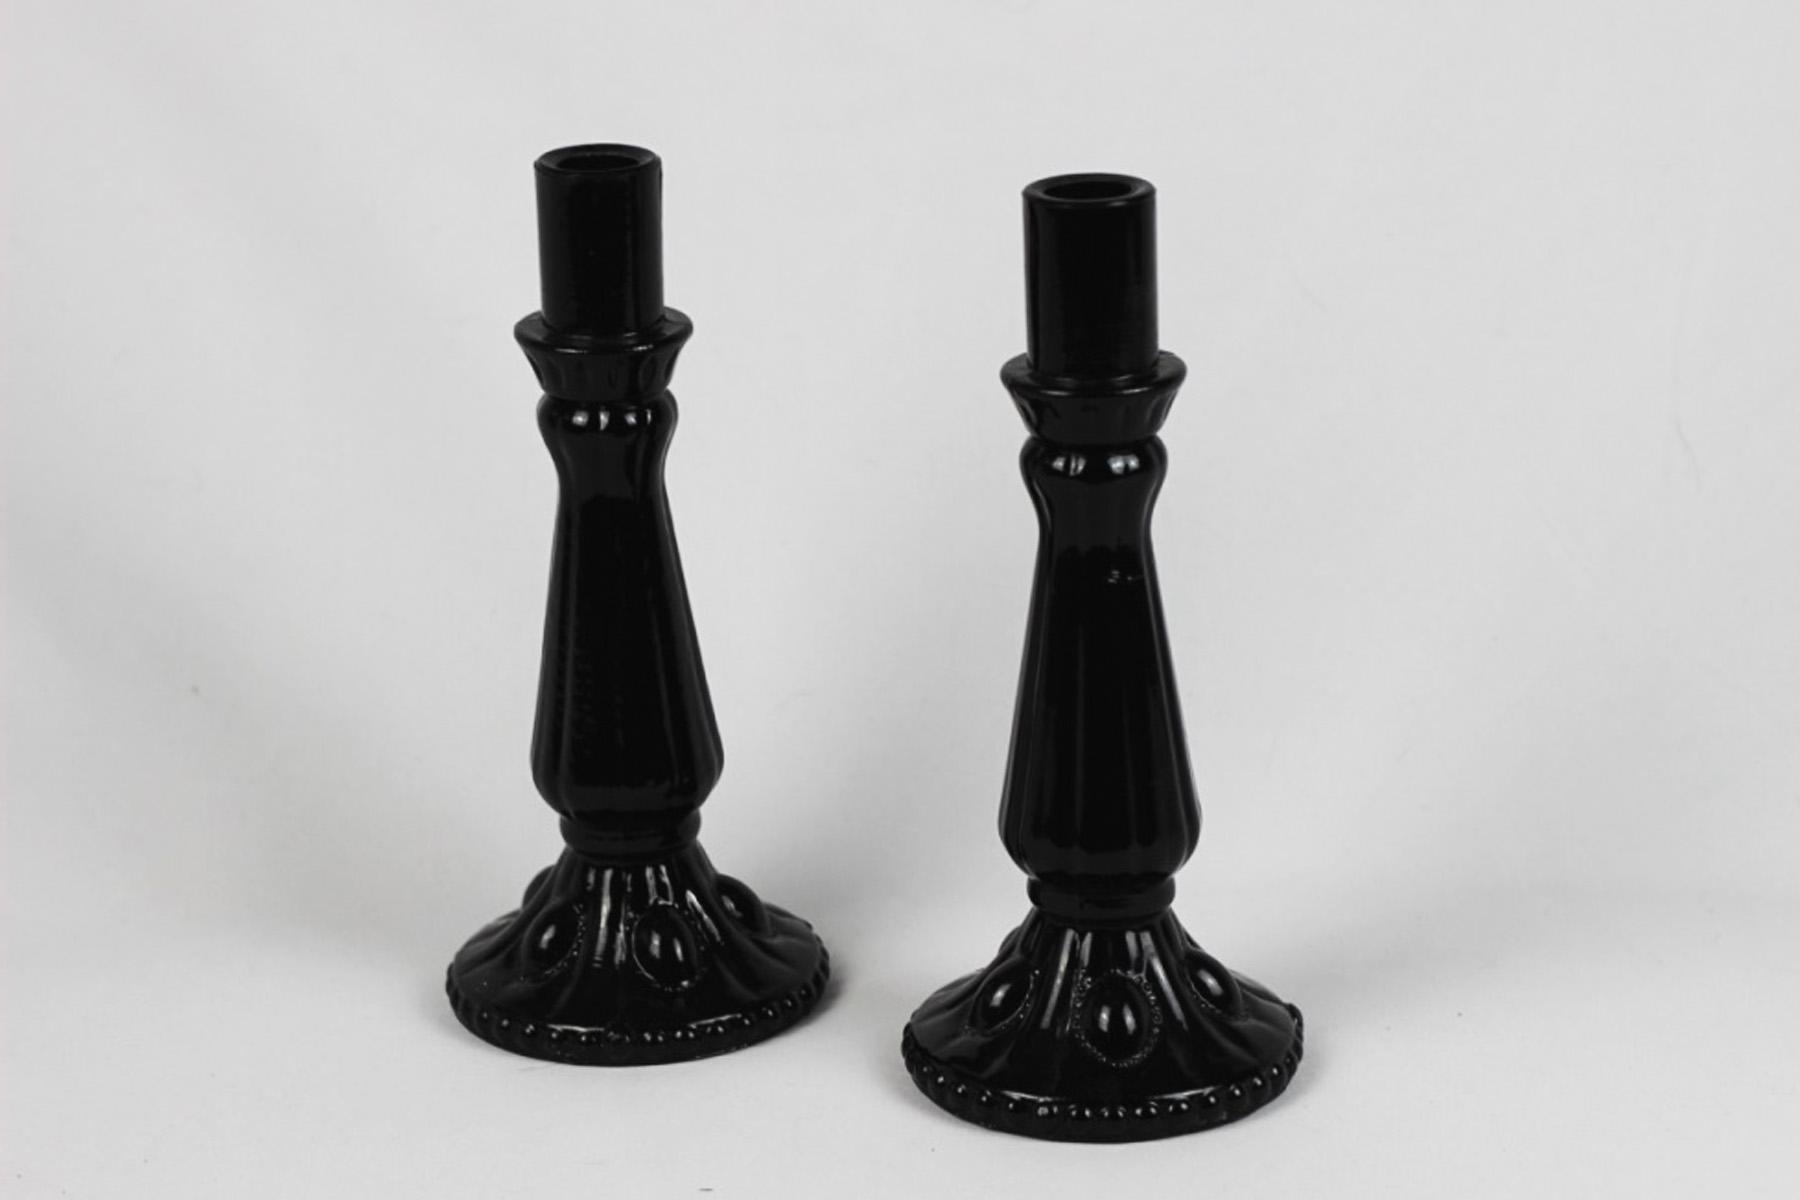 Black Glass Candlesticks - Wedding rentals Austin